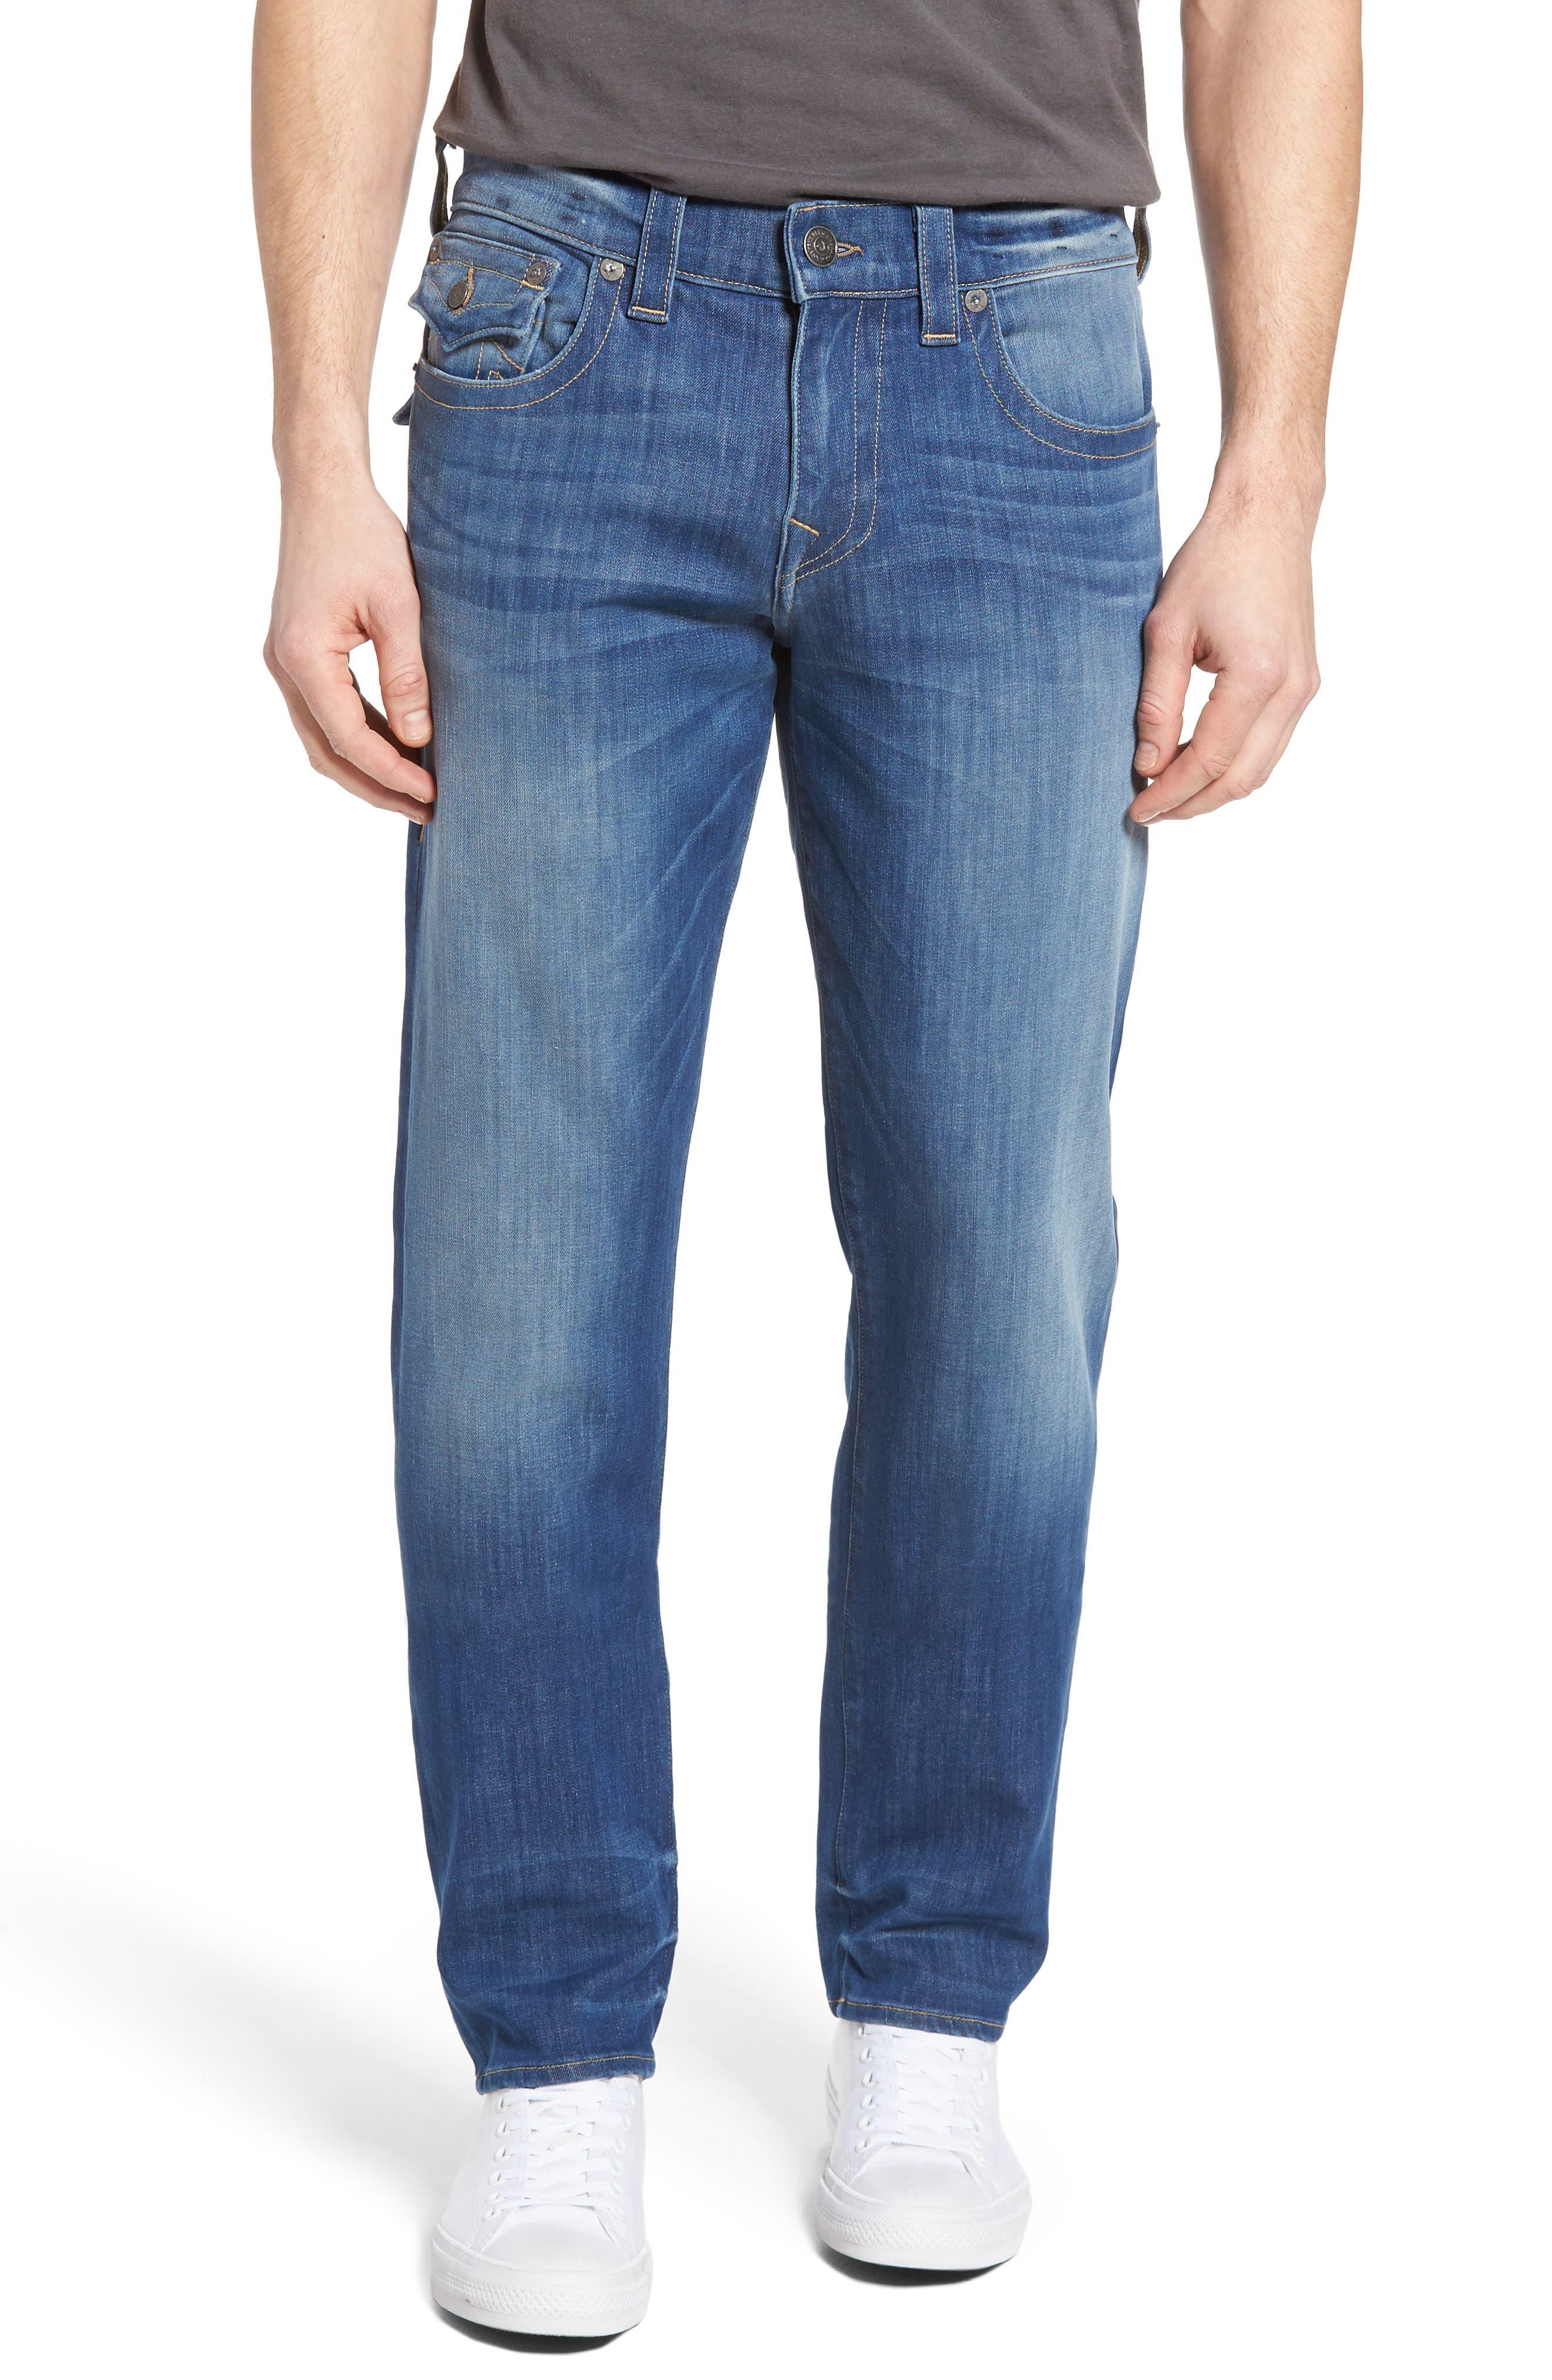 Geno Straight Leg Jeans,                         Main,                         color, 400